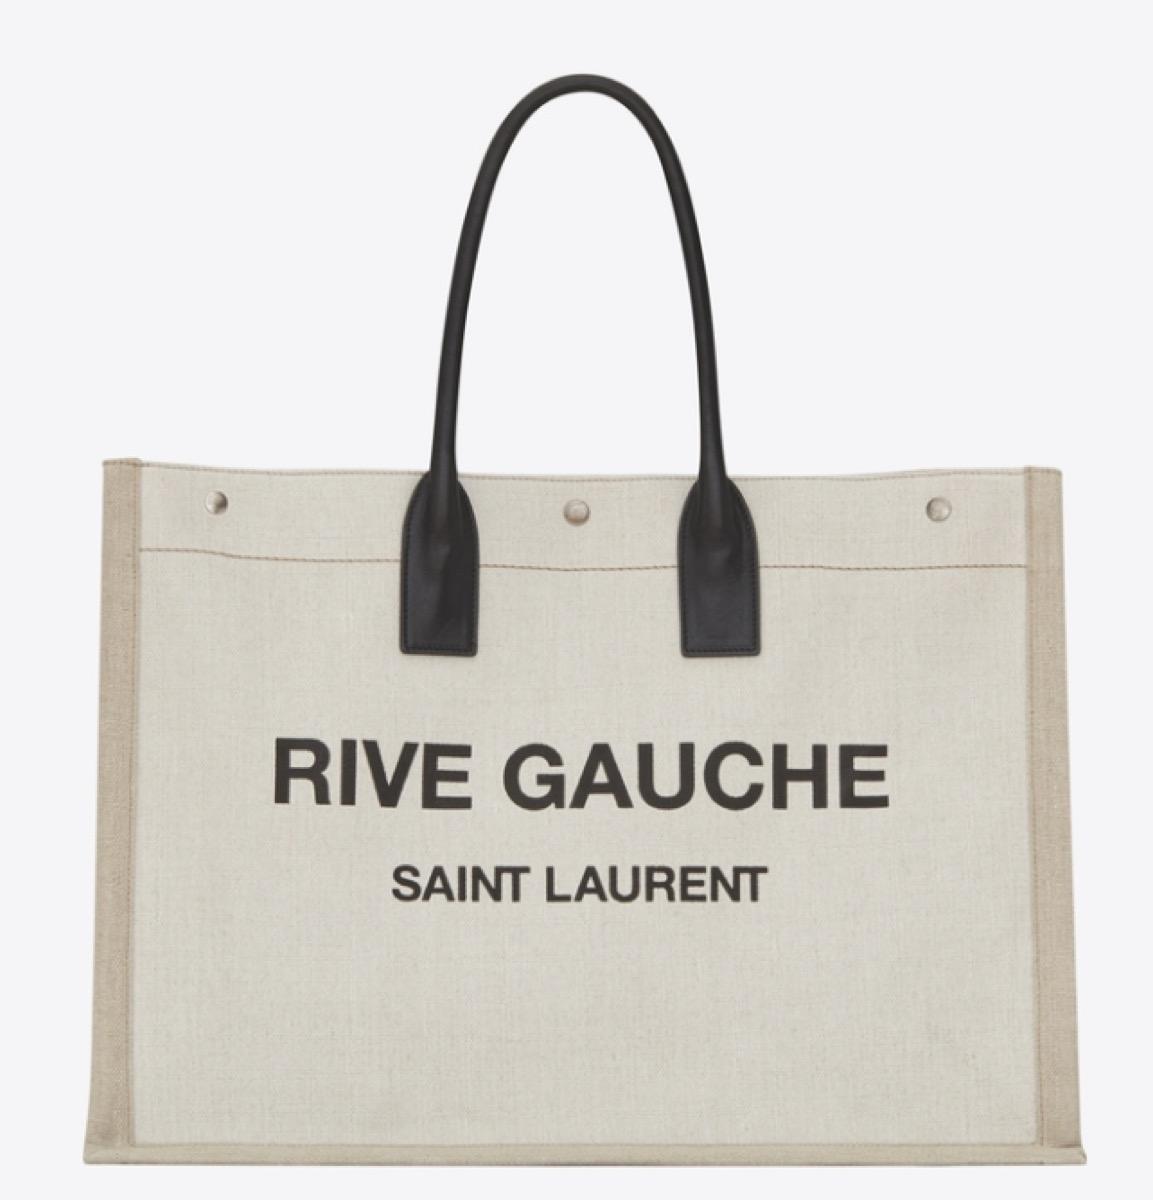 rive gauche tote, luxury beach bags